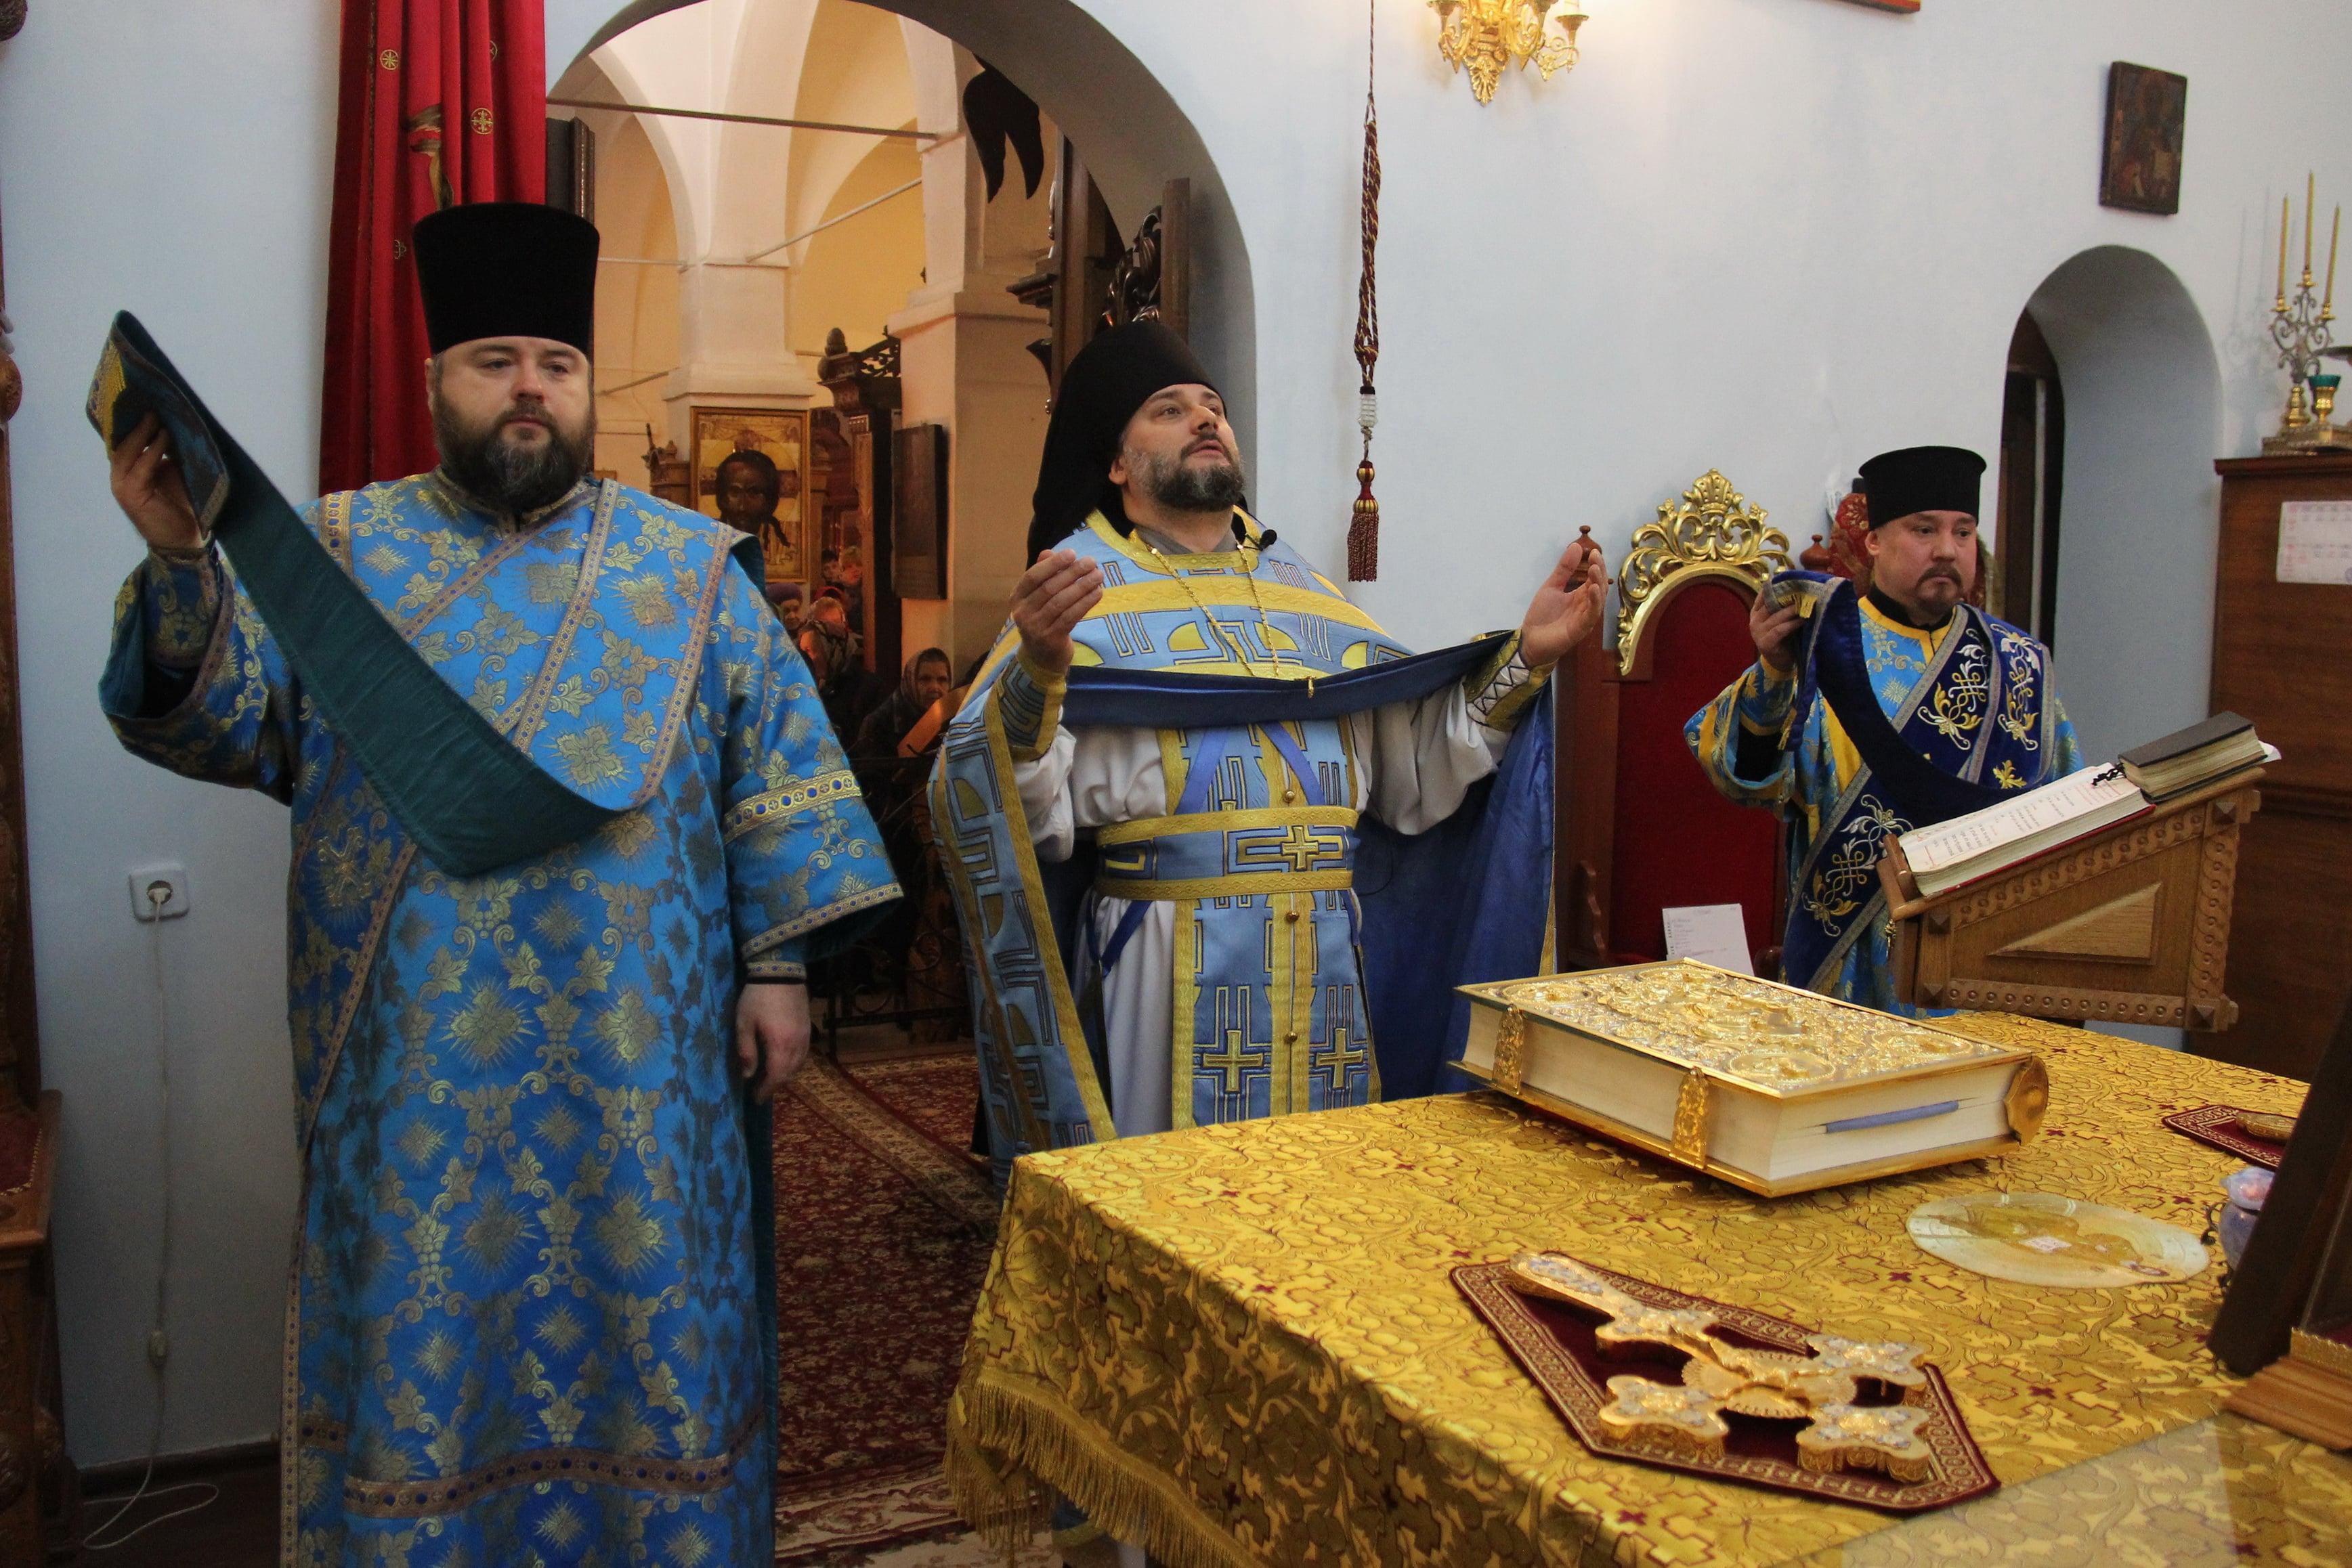 http://monuspen.ru/photoreports/342b84000453e5730cbd714d7faf133s.JPG